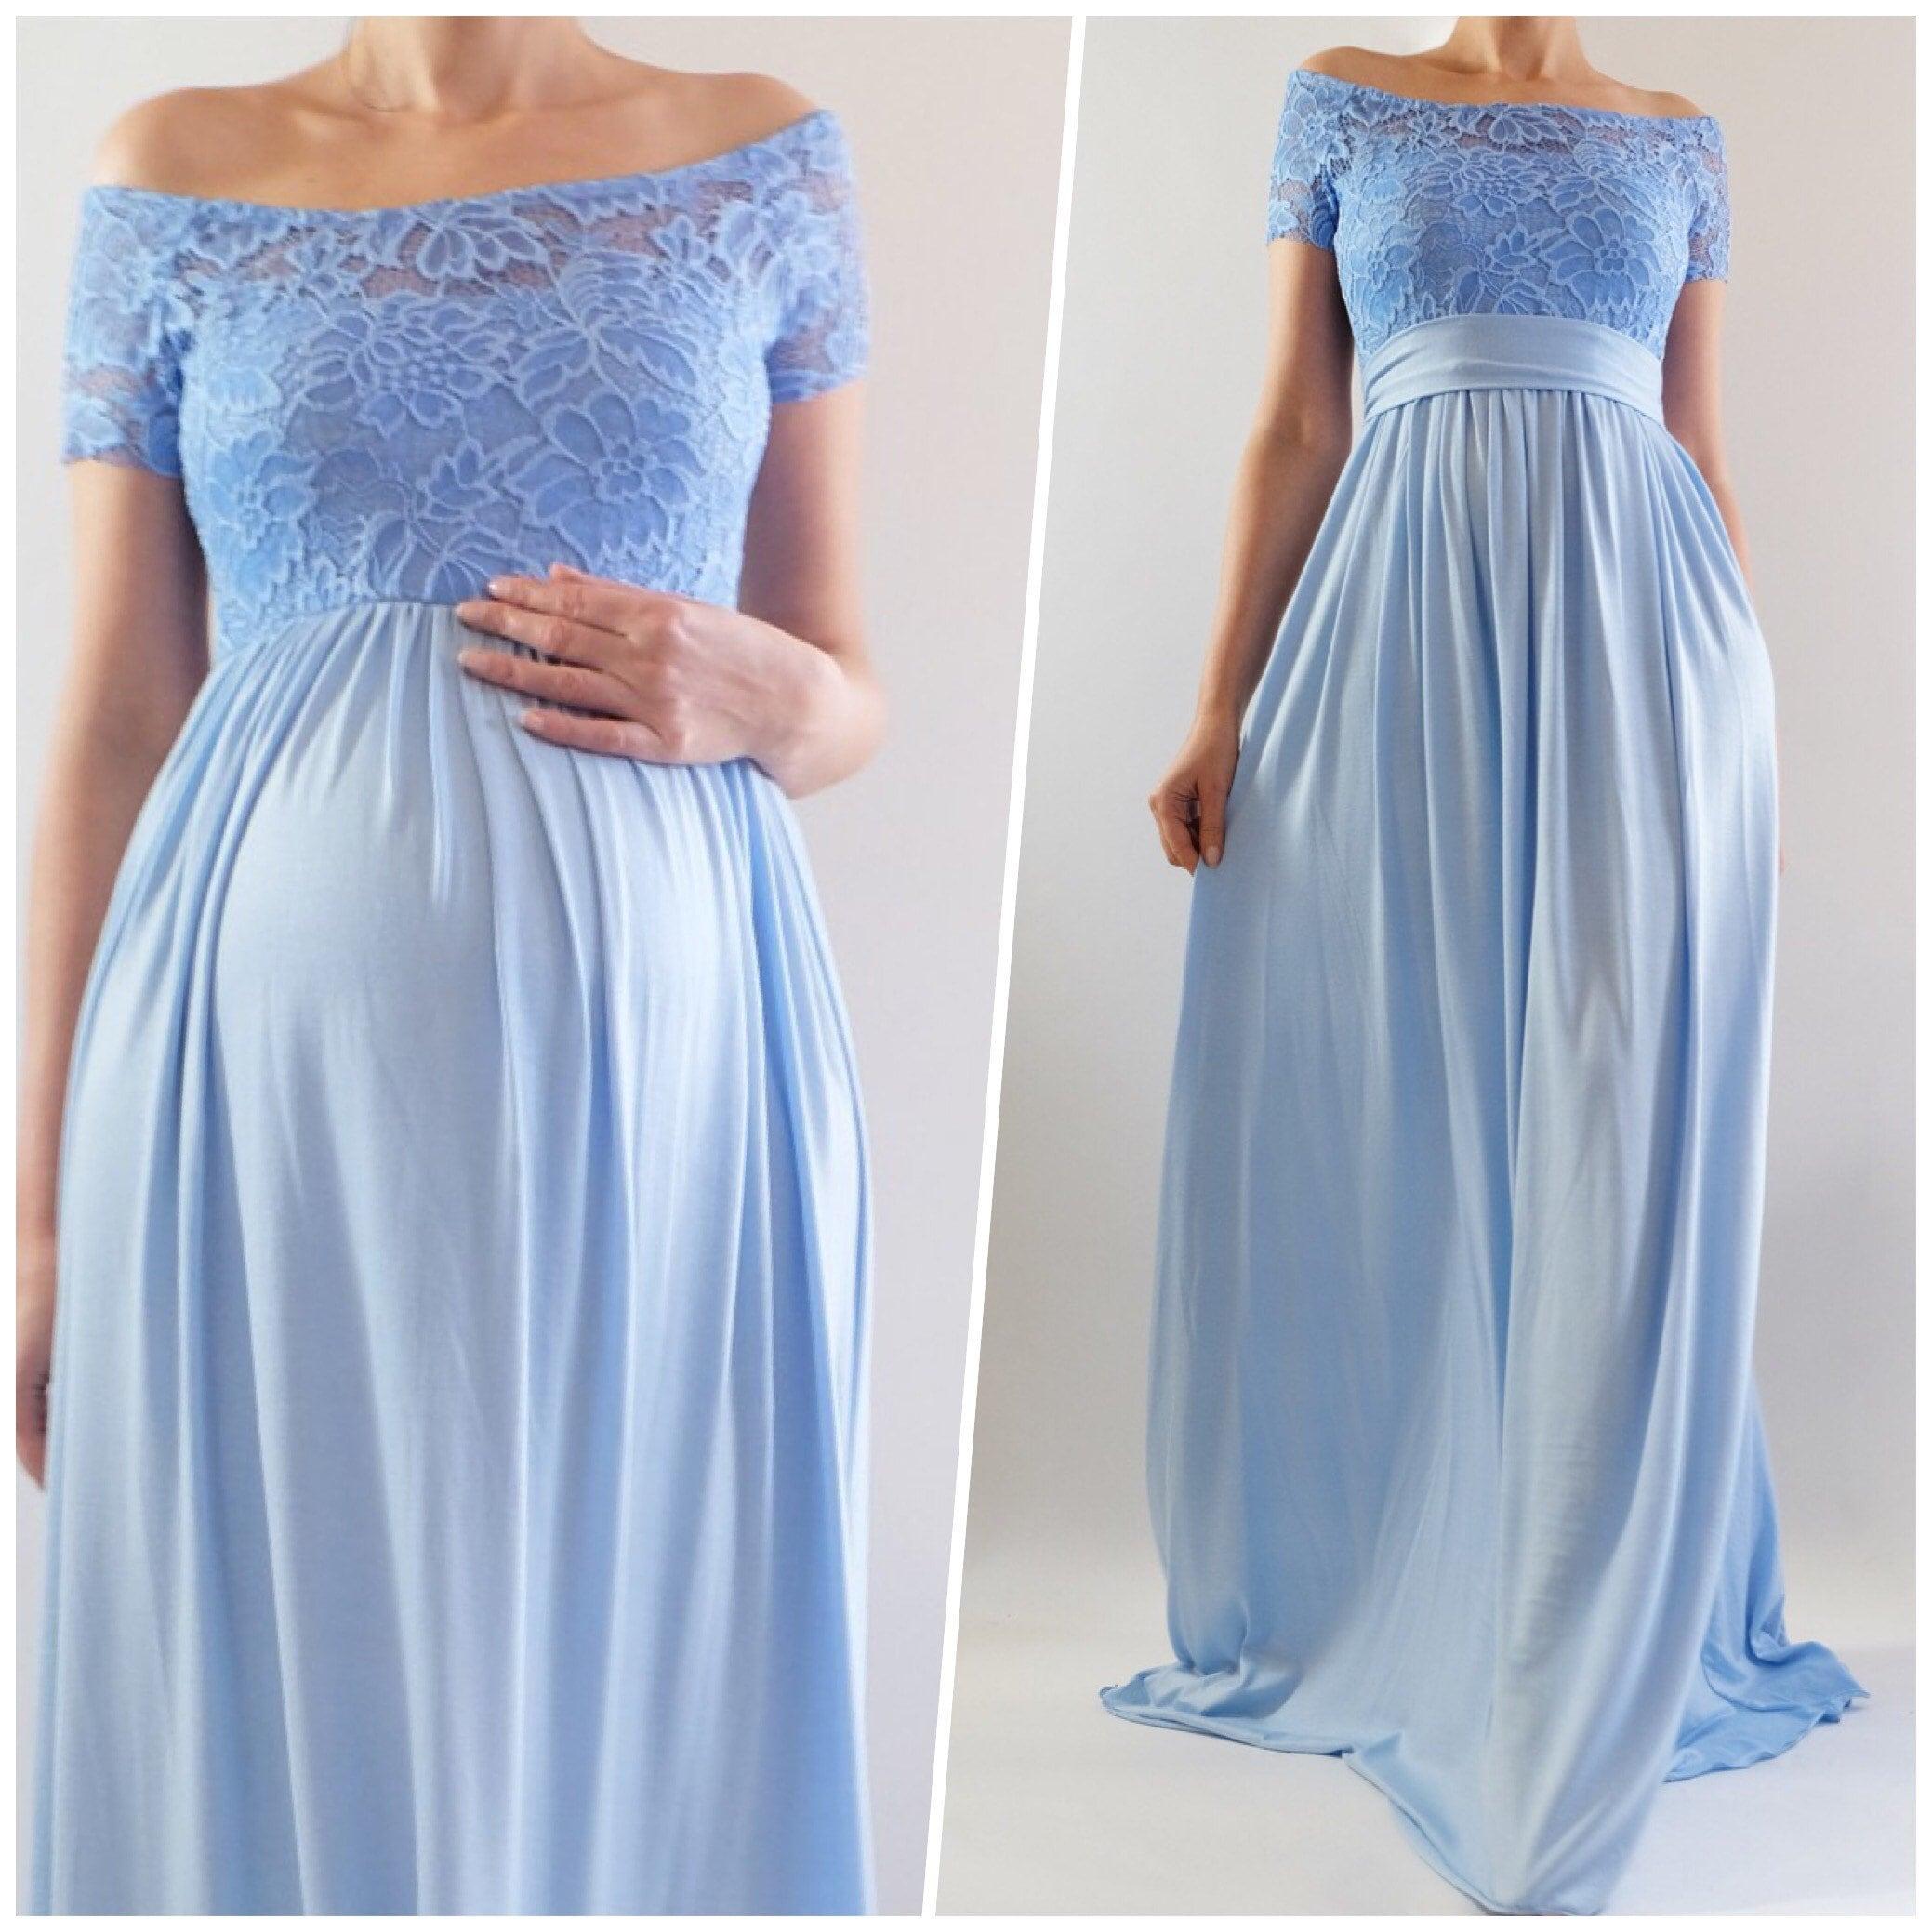 860ea526b8331 Lace Maternity Dress For Photoshoot Amazon | Huston Fislar Photography